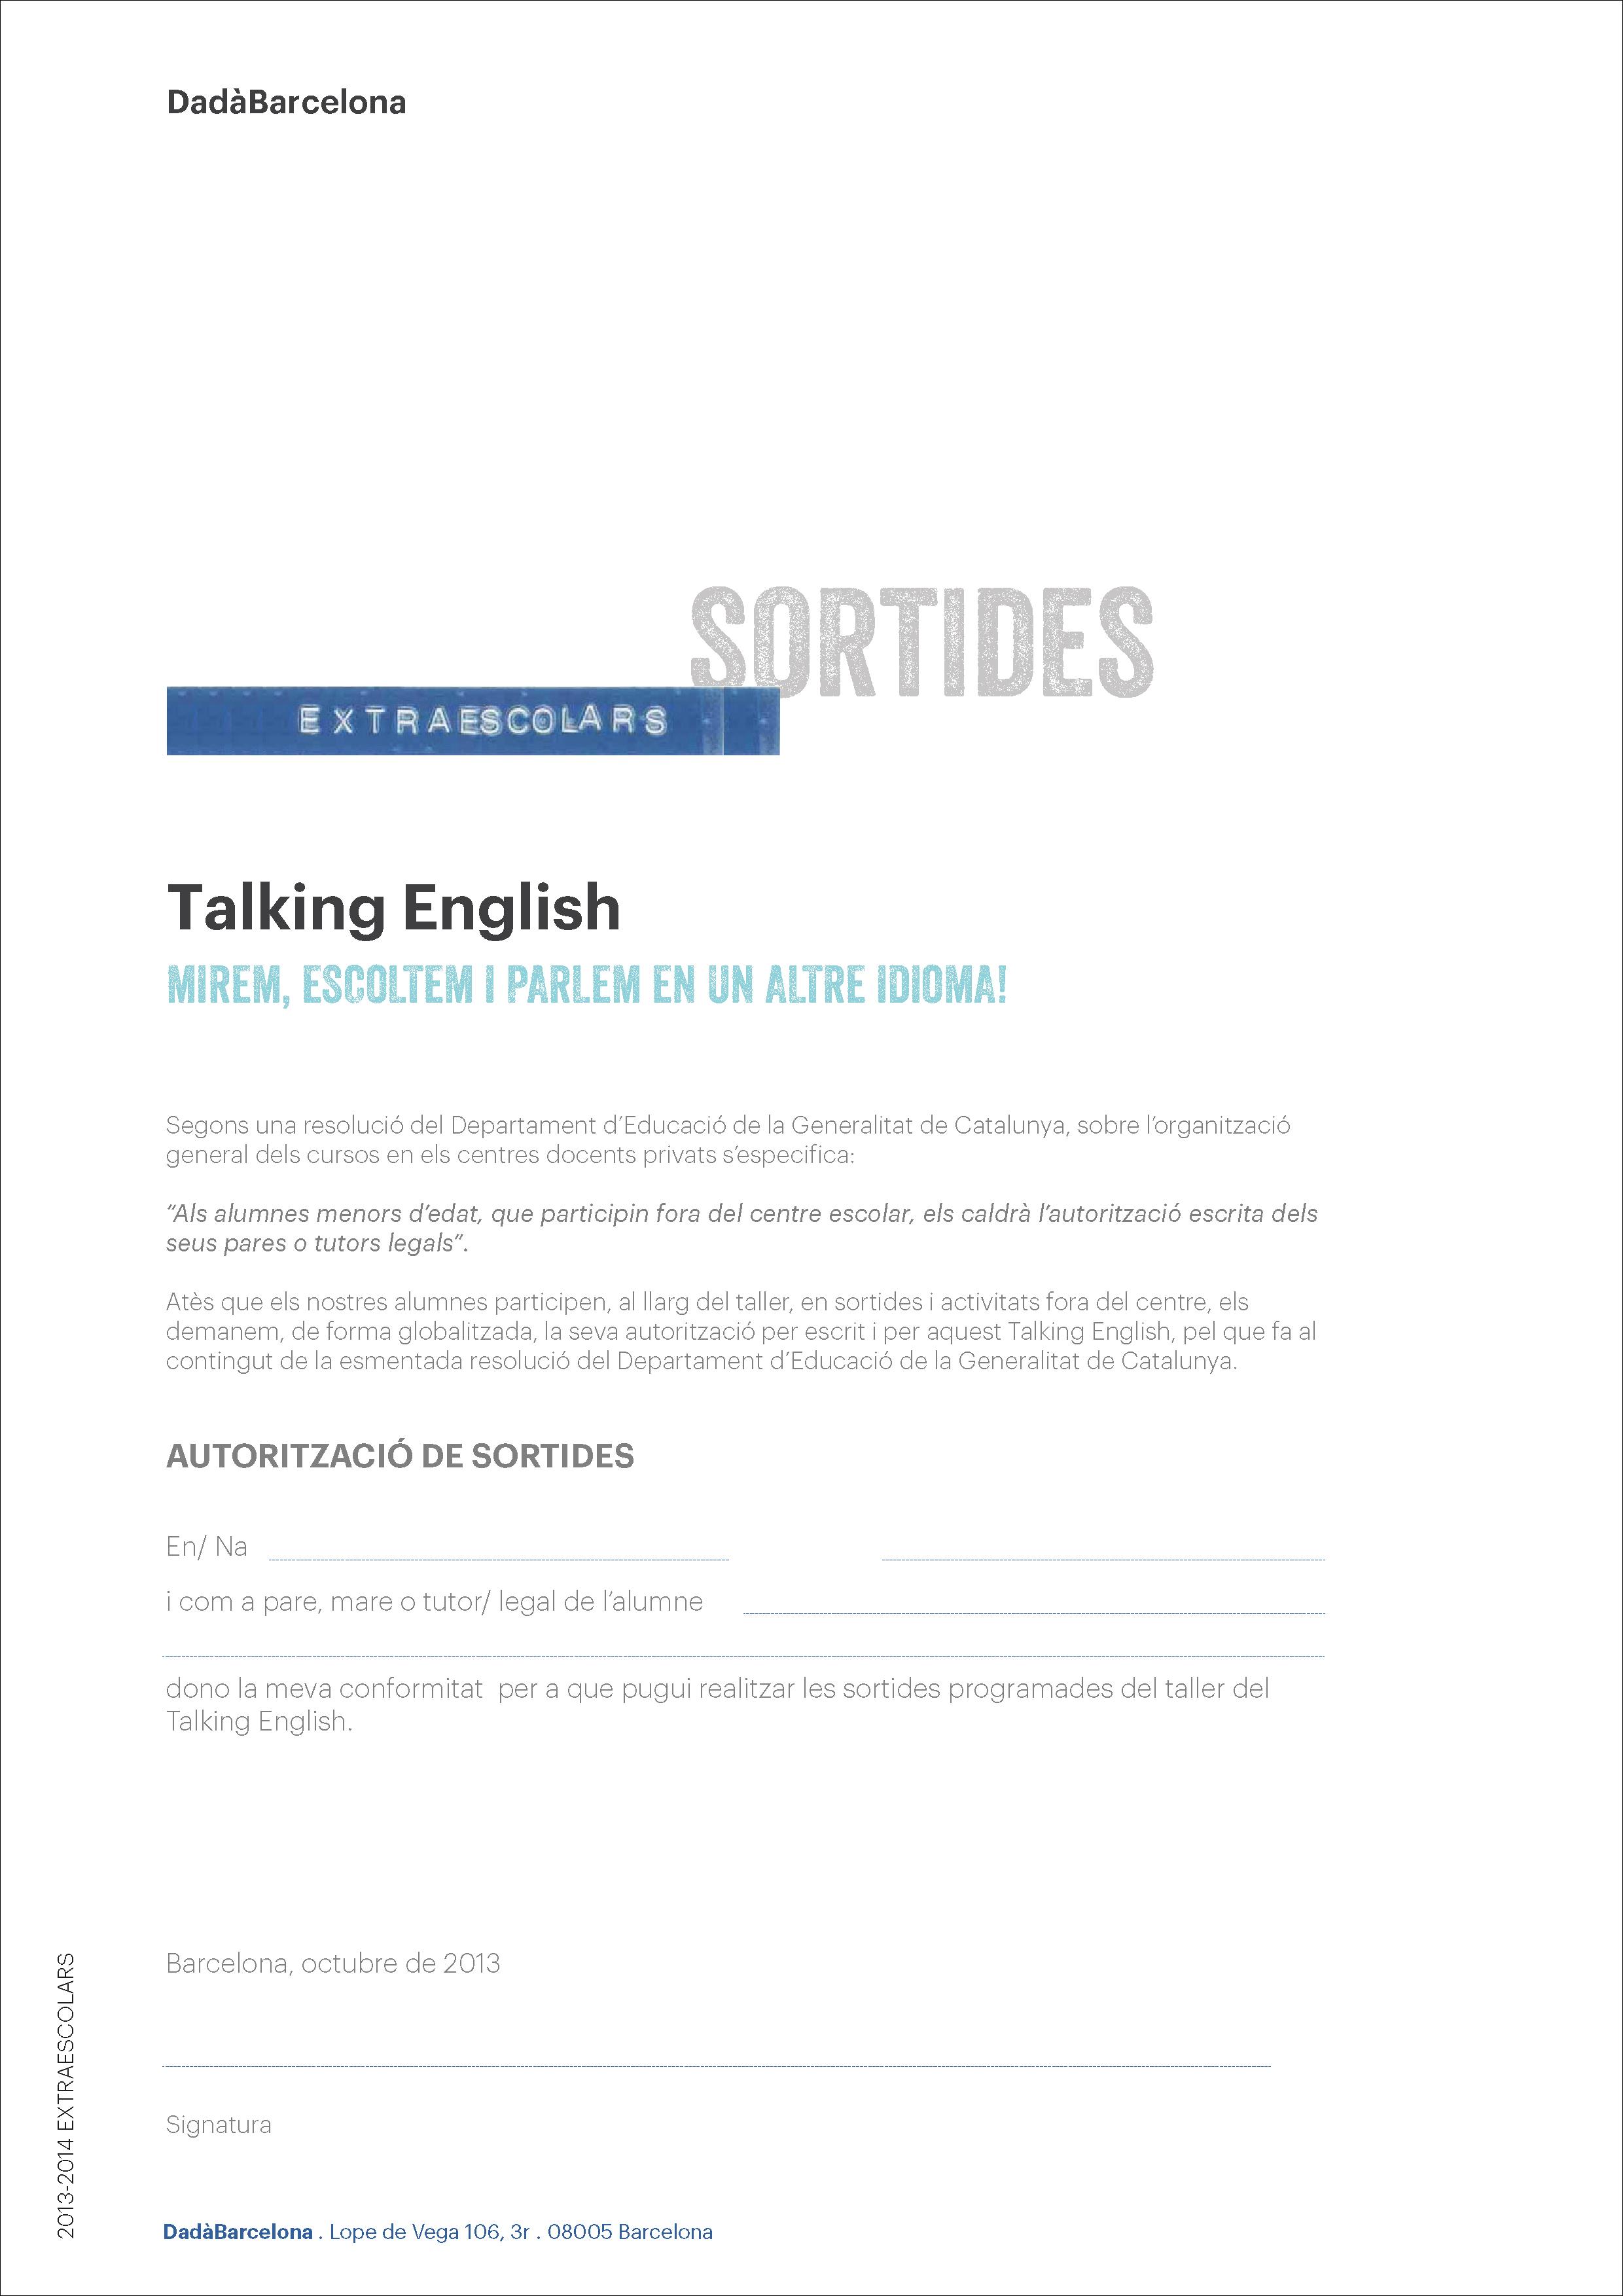 TalkingEnglish_autoritzacio_SORTIDES.jpg